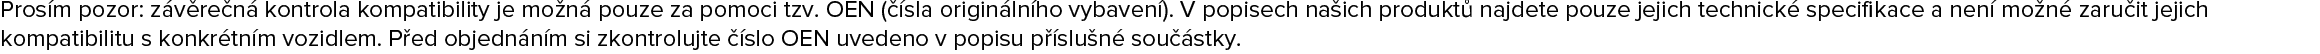 DAKAtec 1062545, 1066383, 1079388, 1085854, 1087548 Generátor impulsů, klikový hřídel